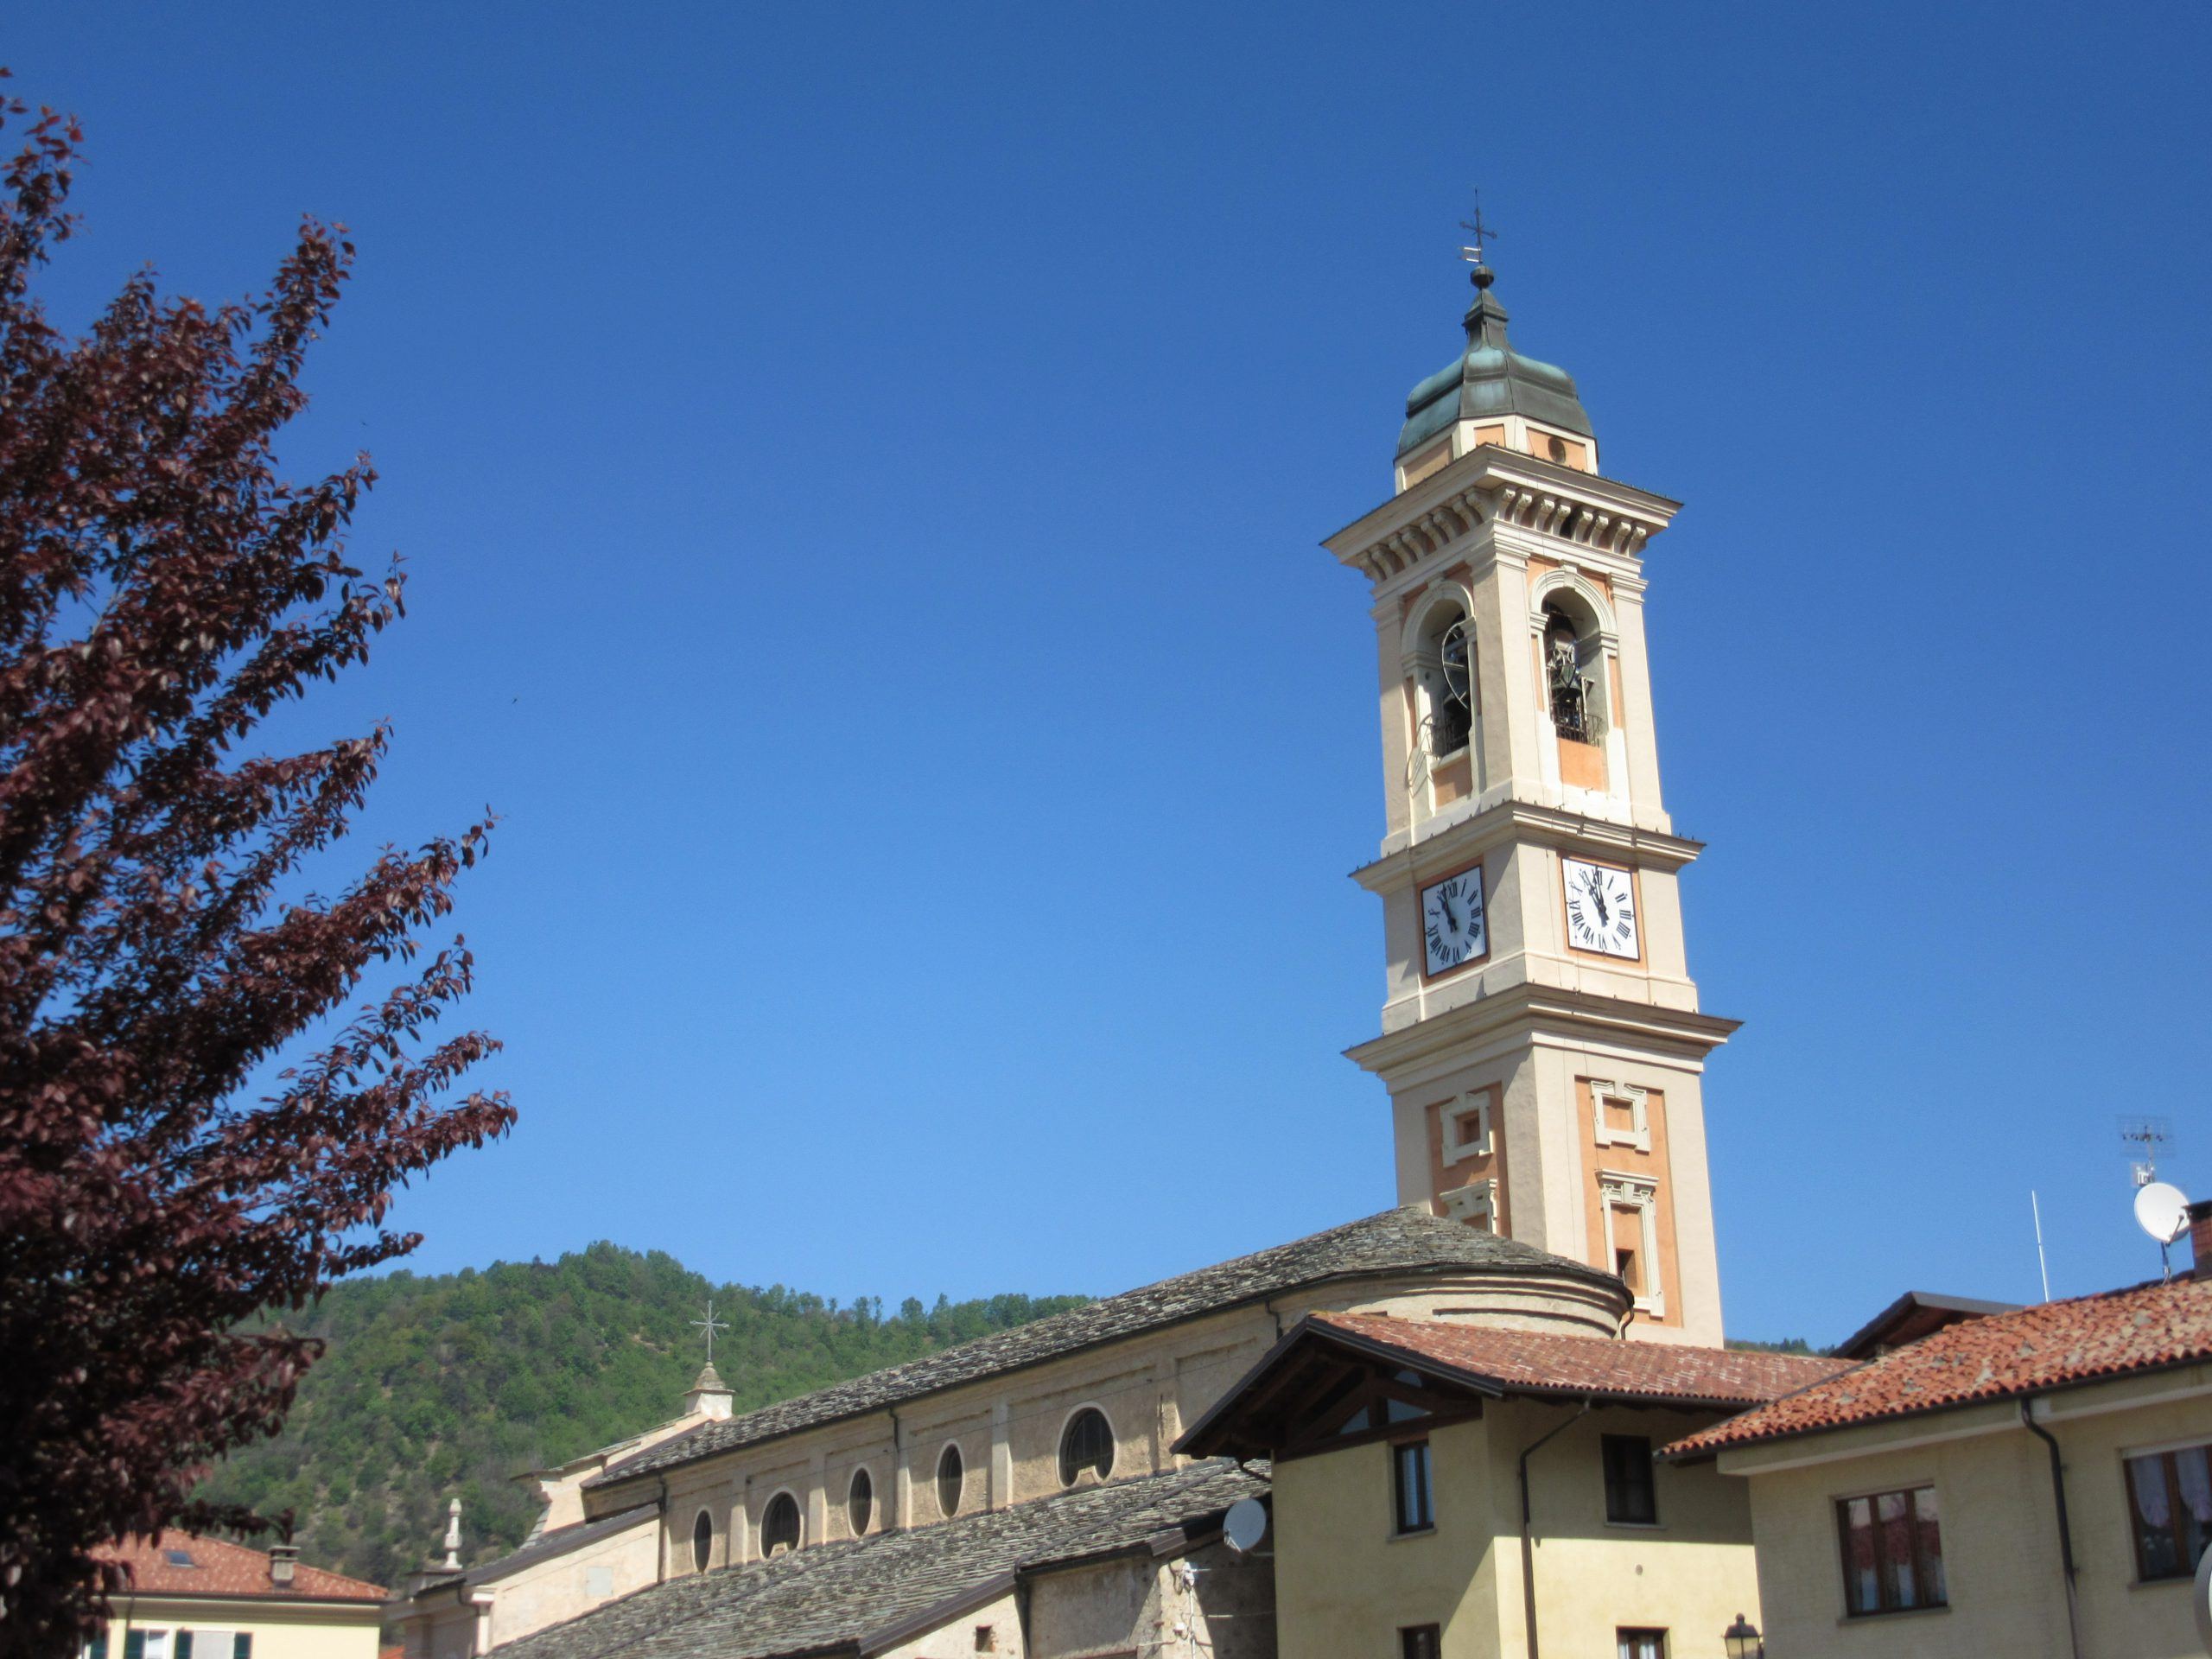 Roccaforte Mondovì